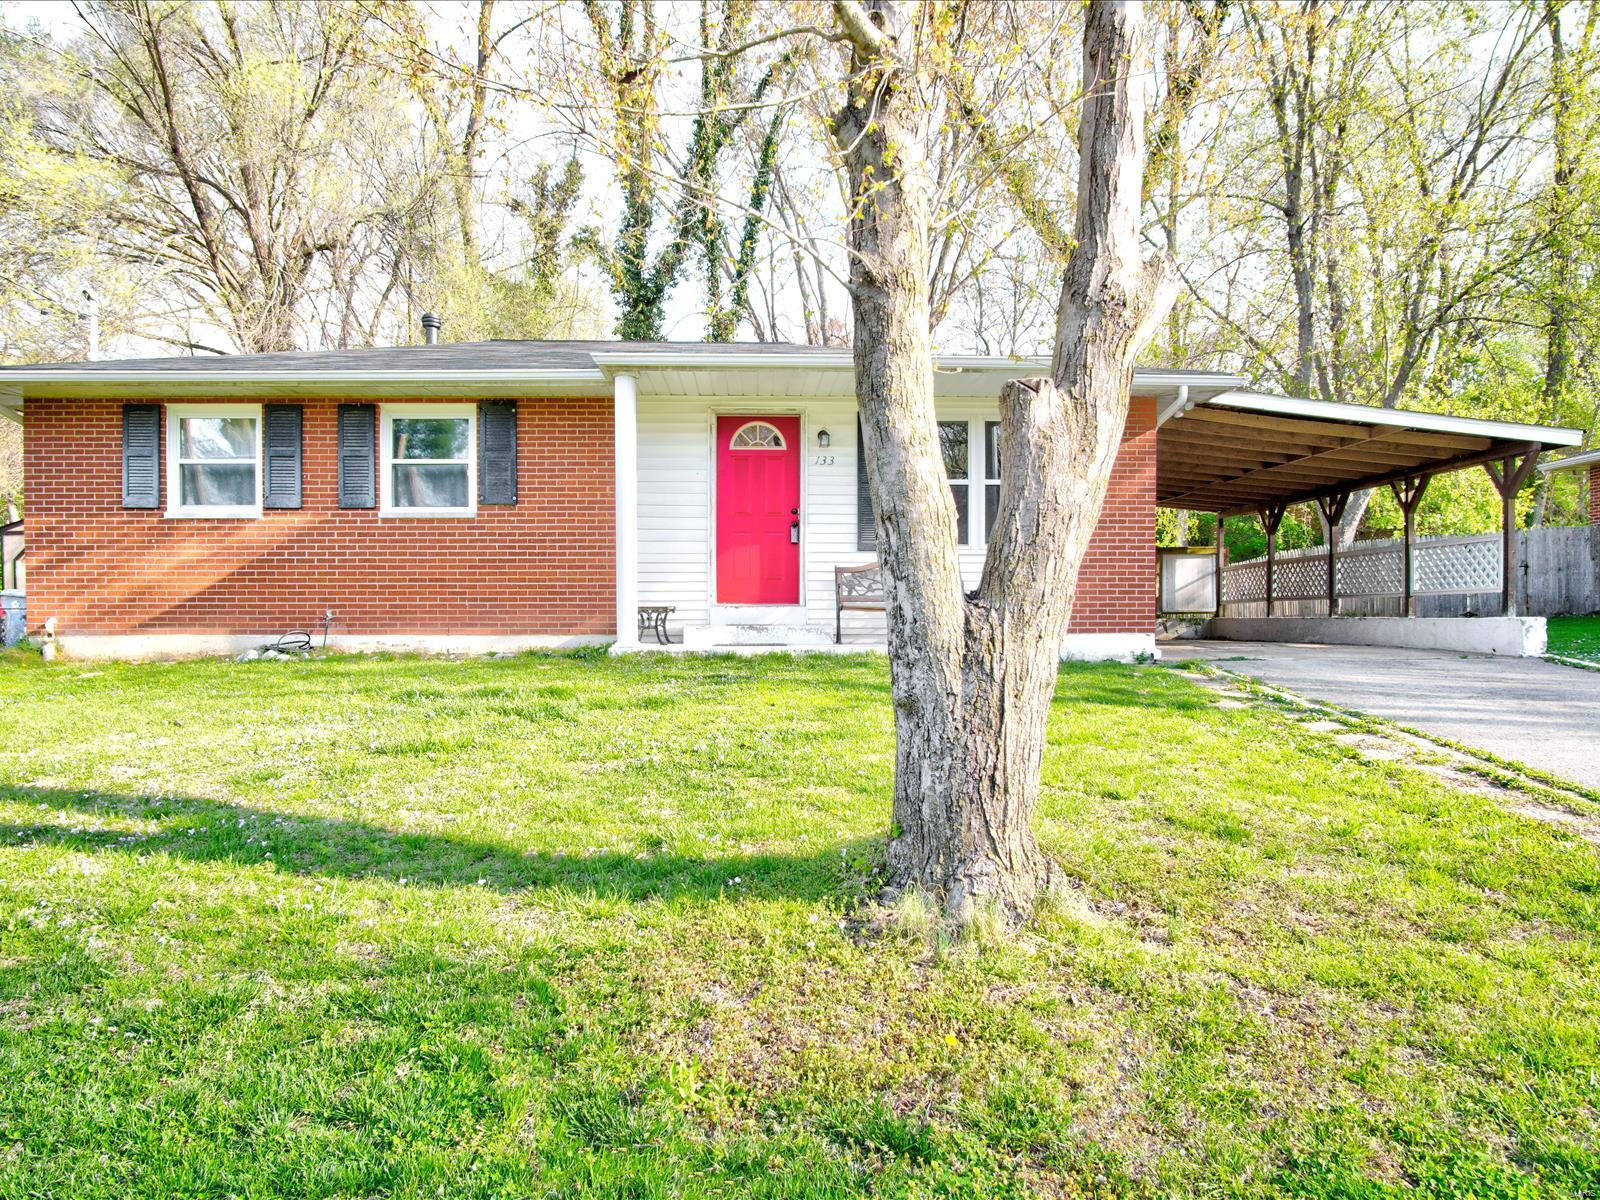 133 Ridgemoor Property Photo - Glen Carbon, IL real estate listing